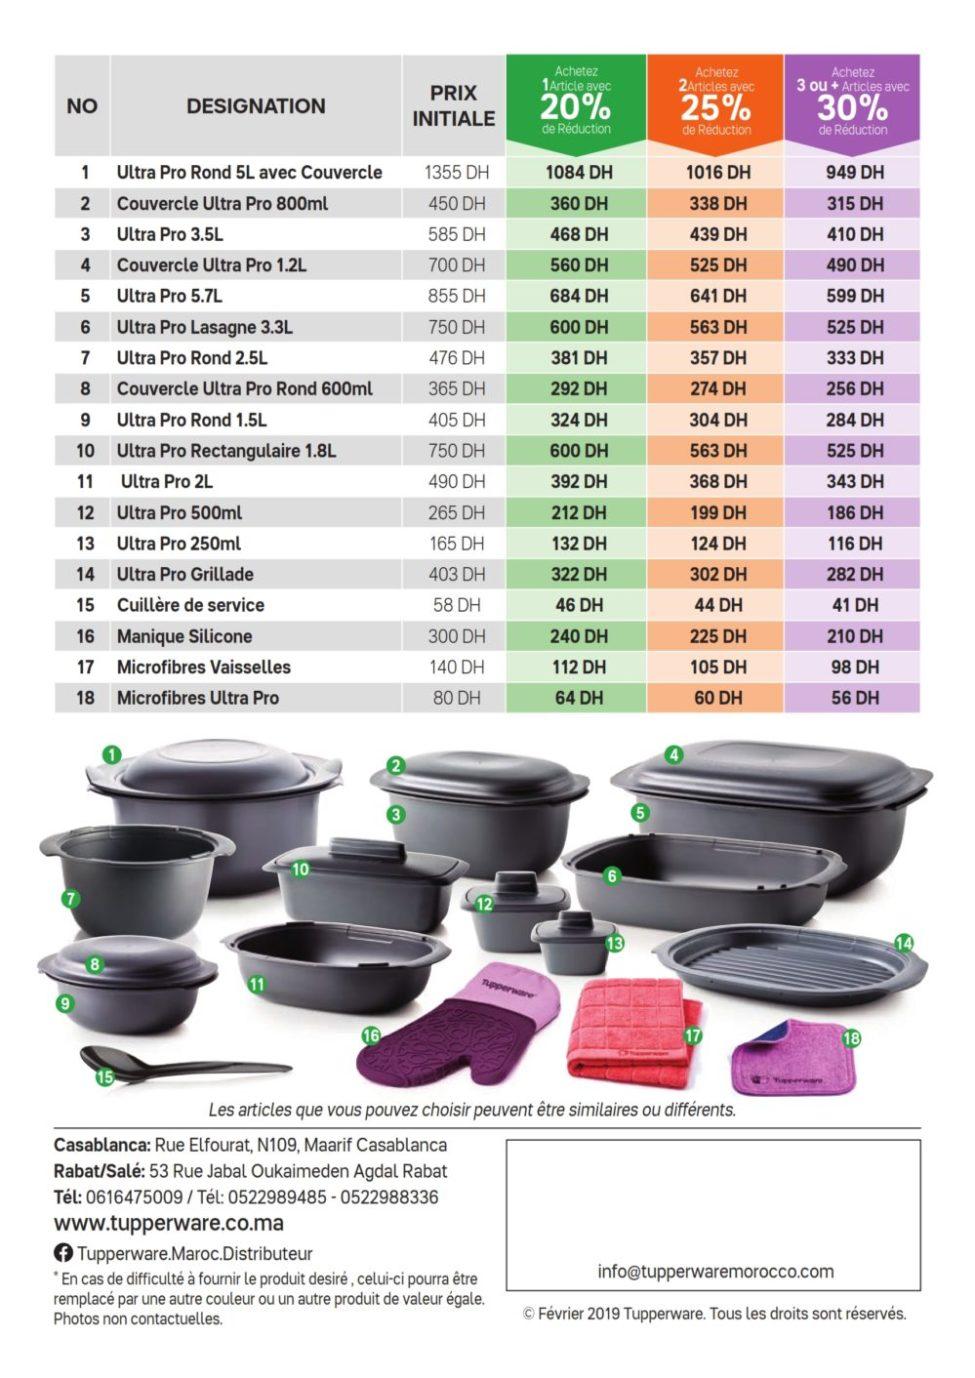 Catalogue Ultra Pro délices Tupperware Maroc jusqu'au 10 Mars 2019